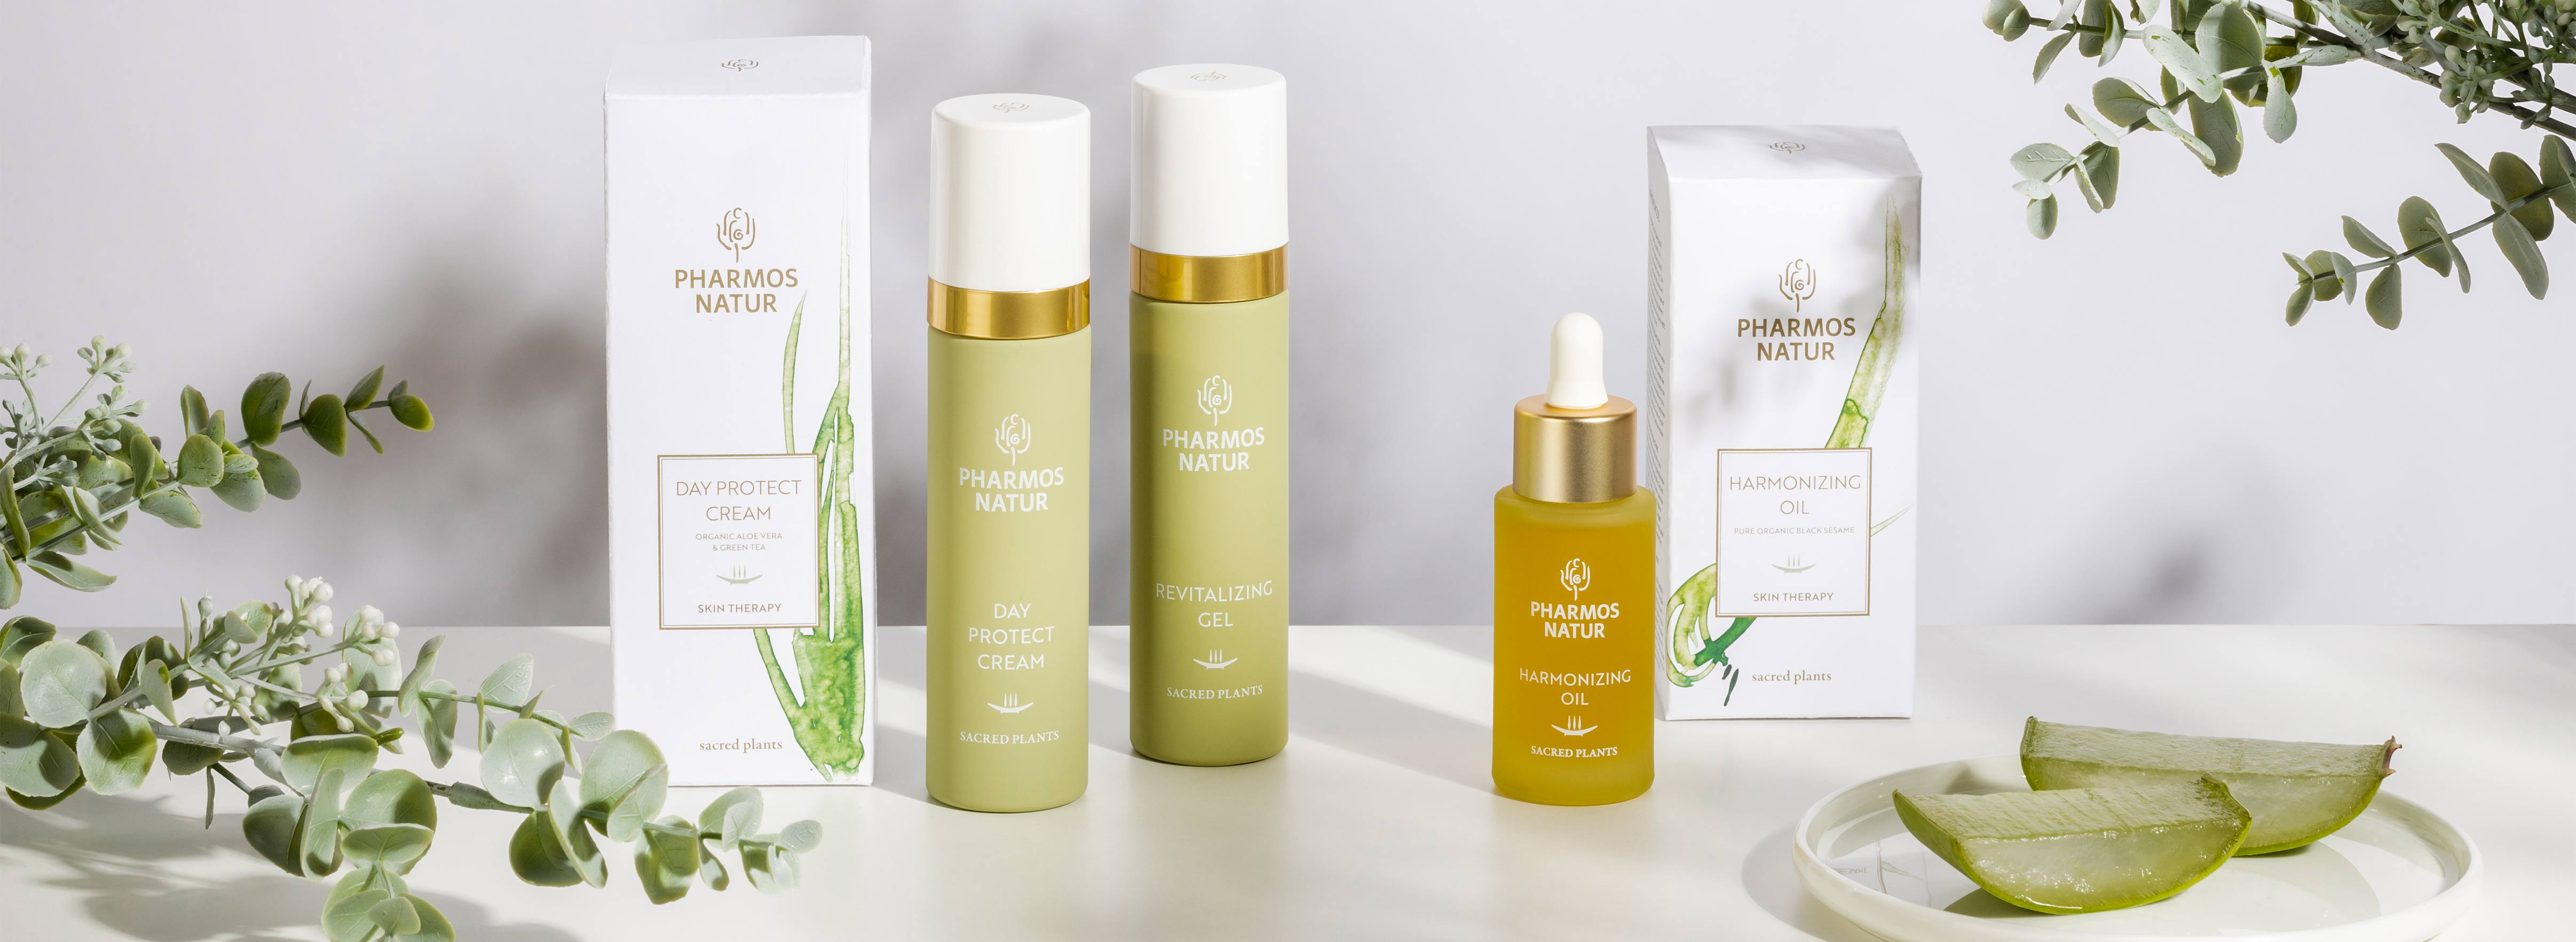 Produktlinie  Skin Therapy Produkte mit Day Protect Cream, Revitalizing Gel und Harmonizing Oil